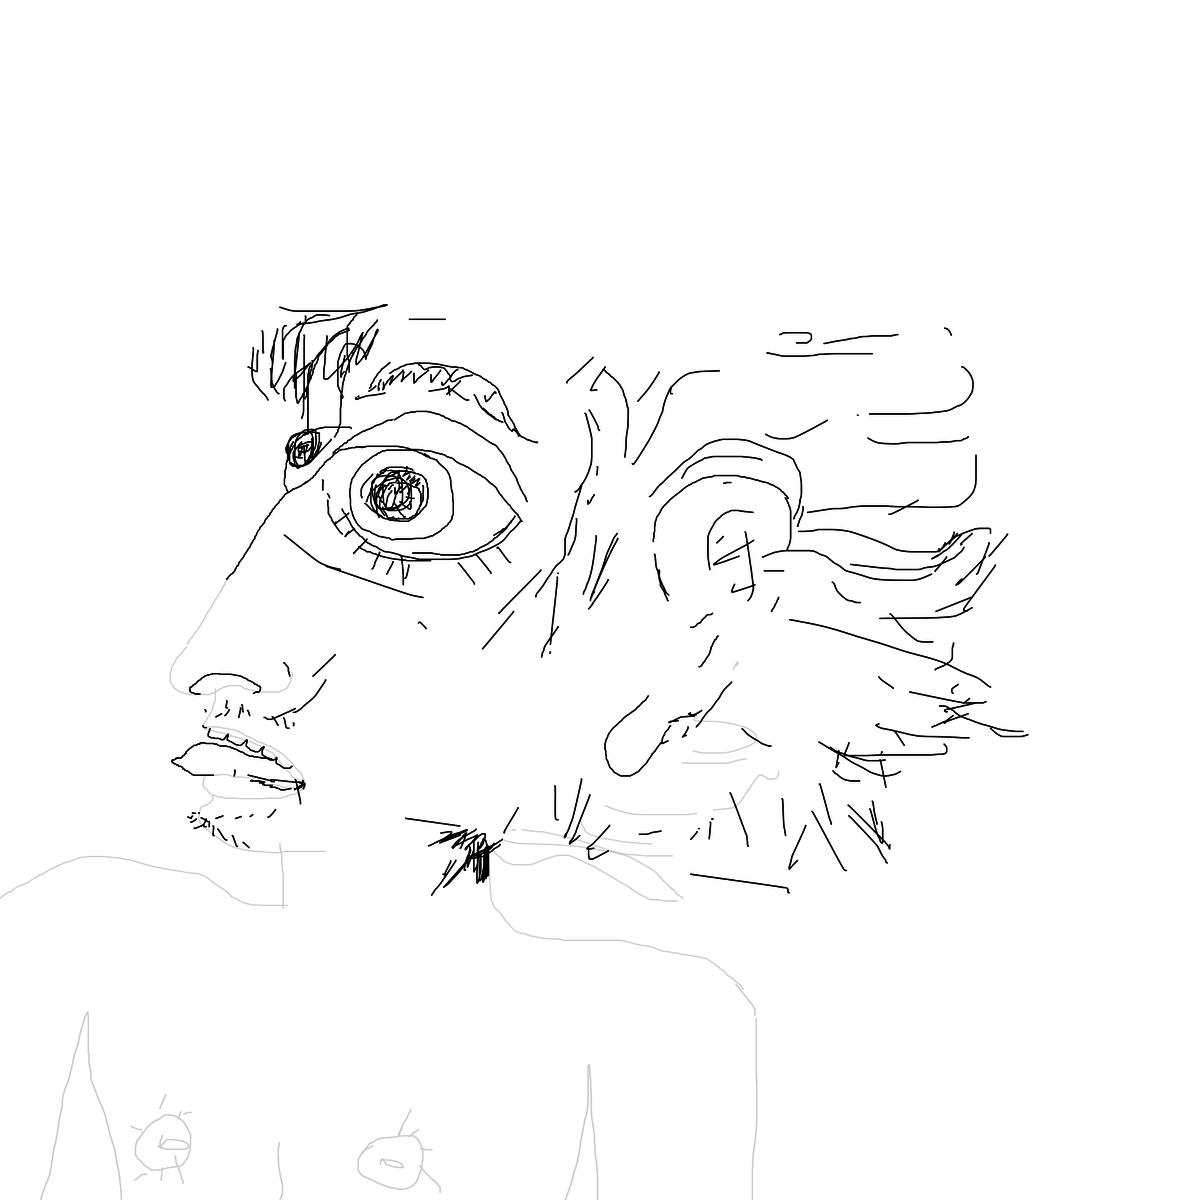 BAAAM drawing#9352 lat:63.4897994995117200lng: 26.3672161102294920